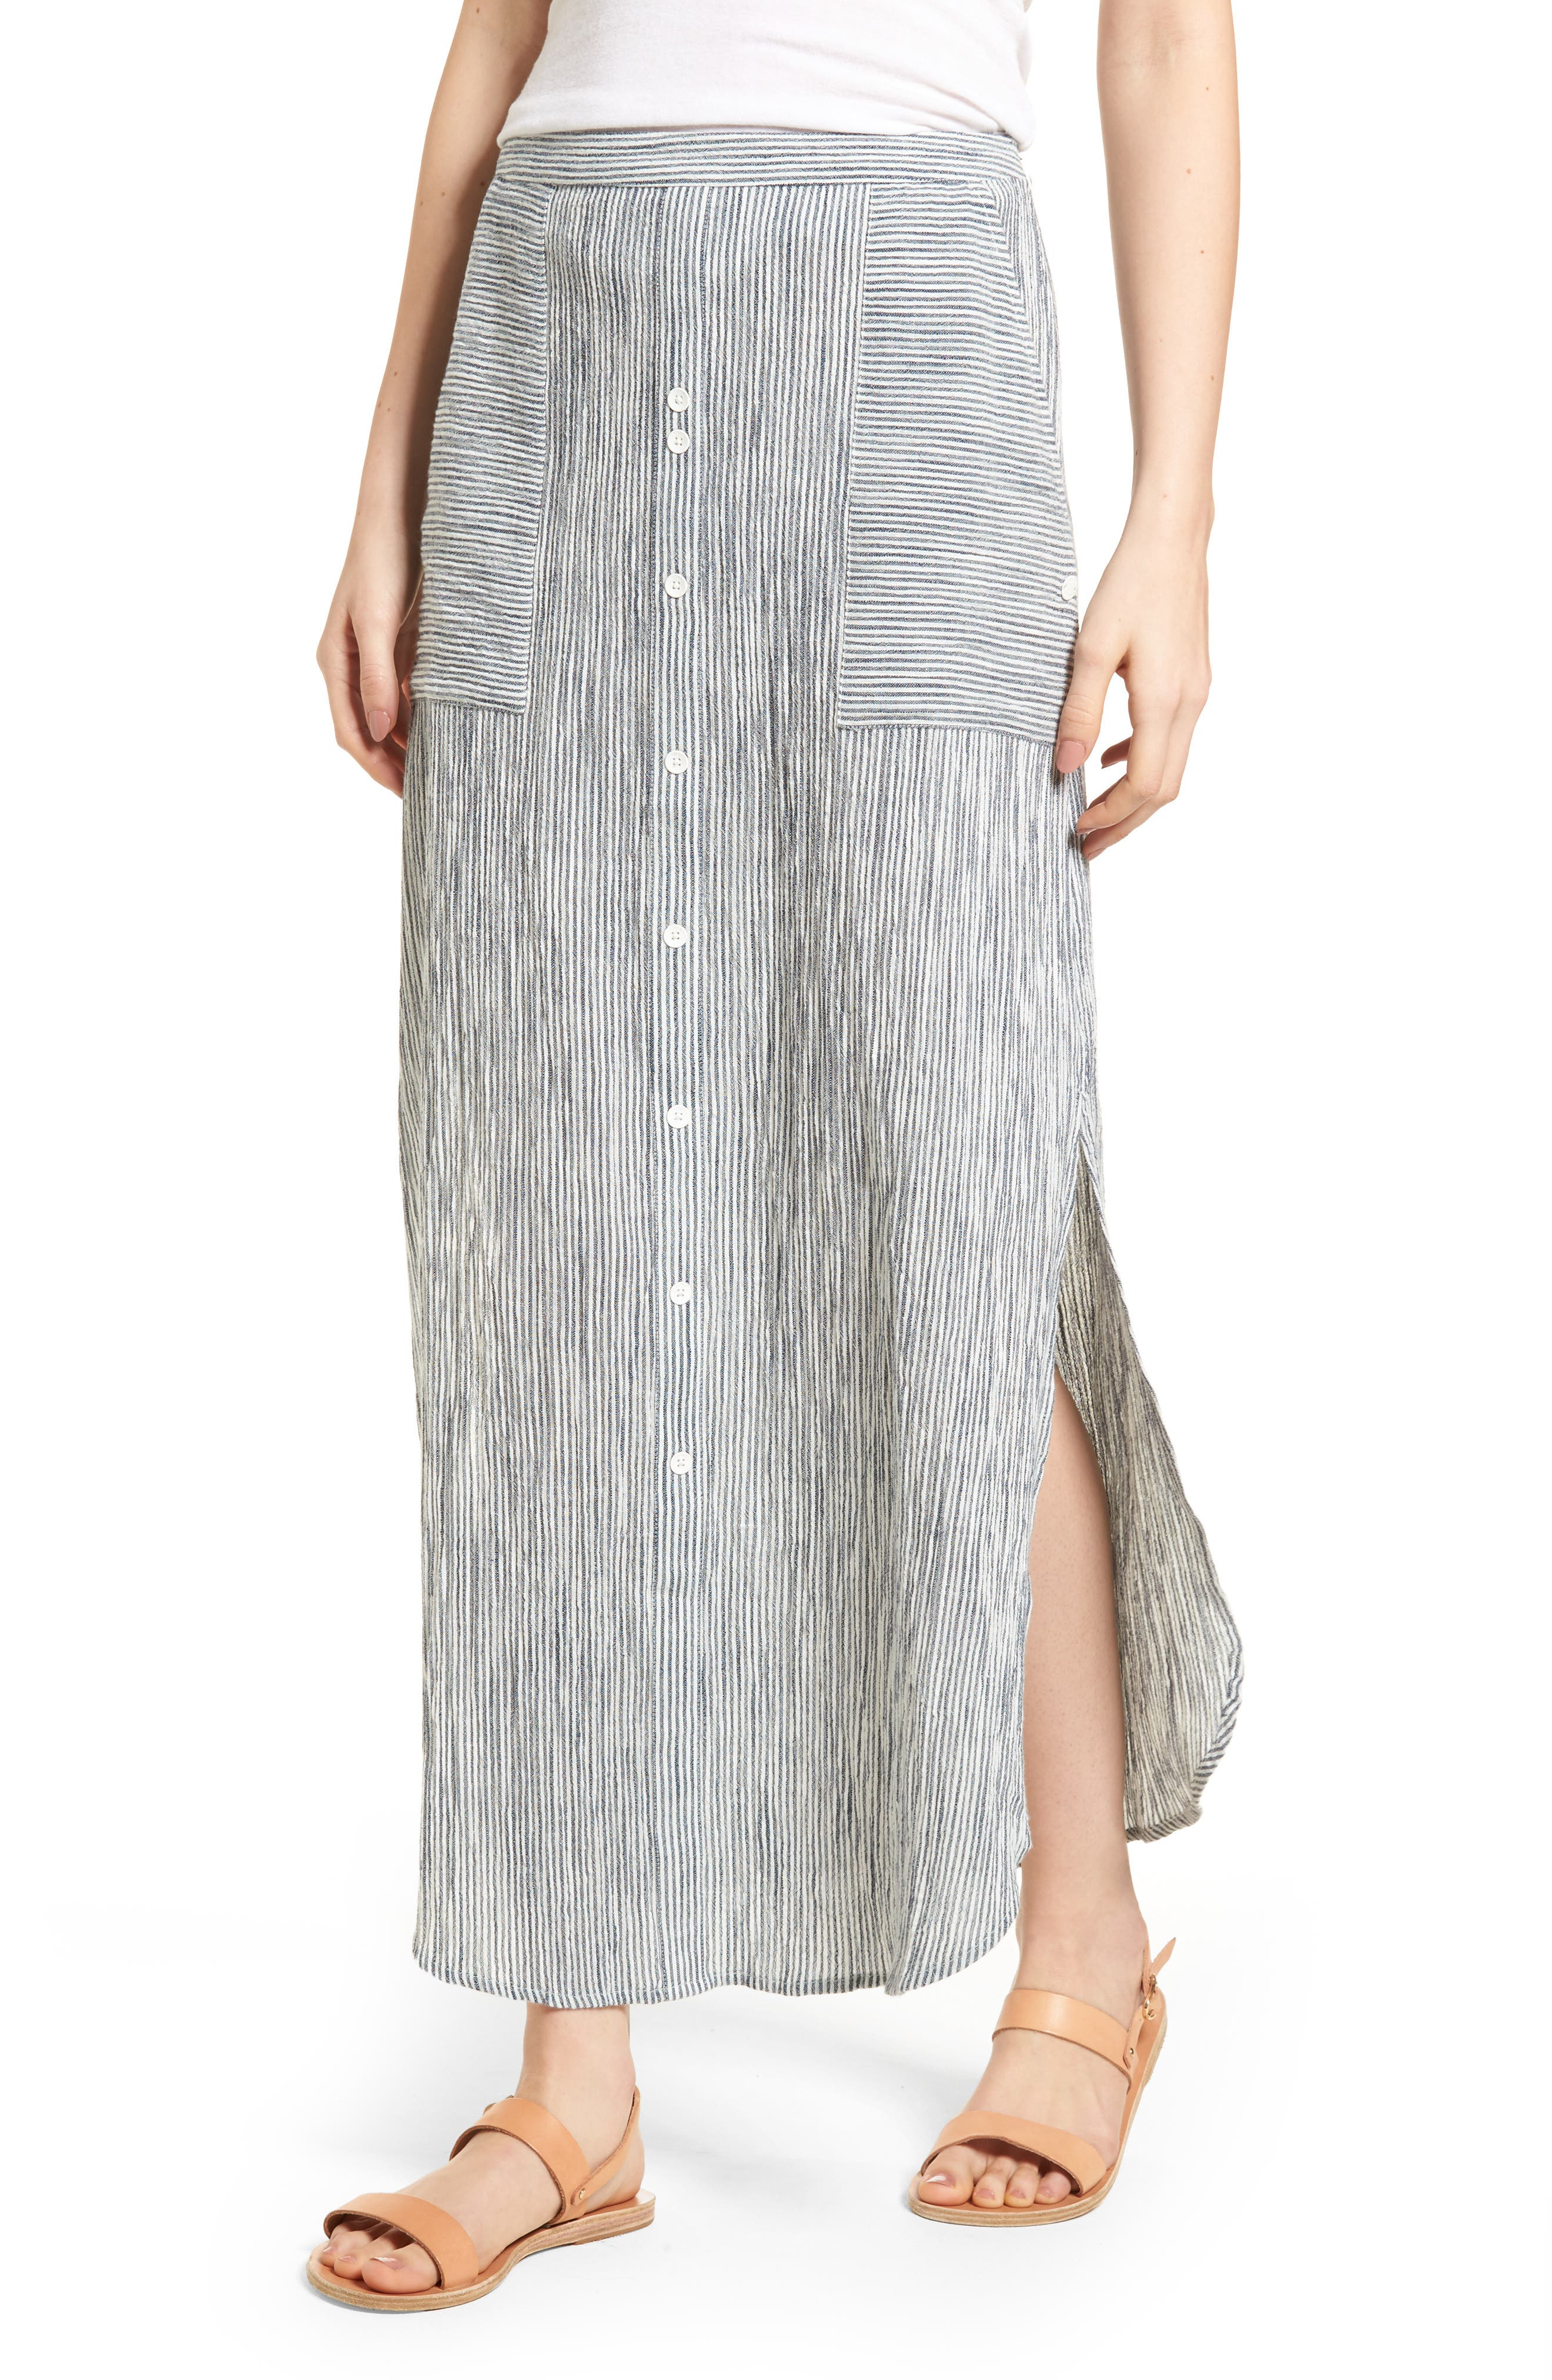 Sunset Islands Pinstripe Maxi Skirt,                         Main,                         color, 101